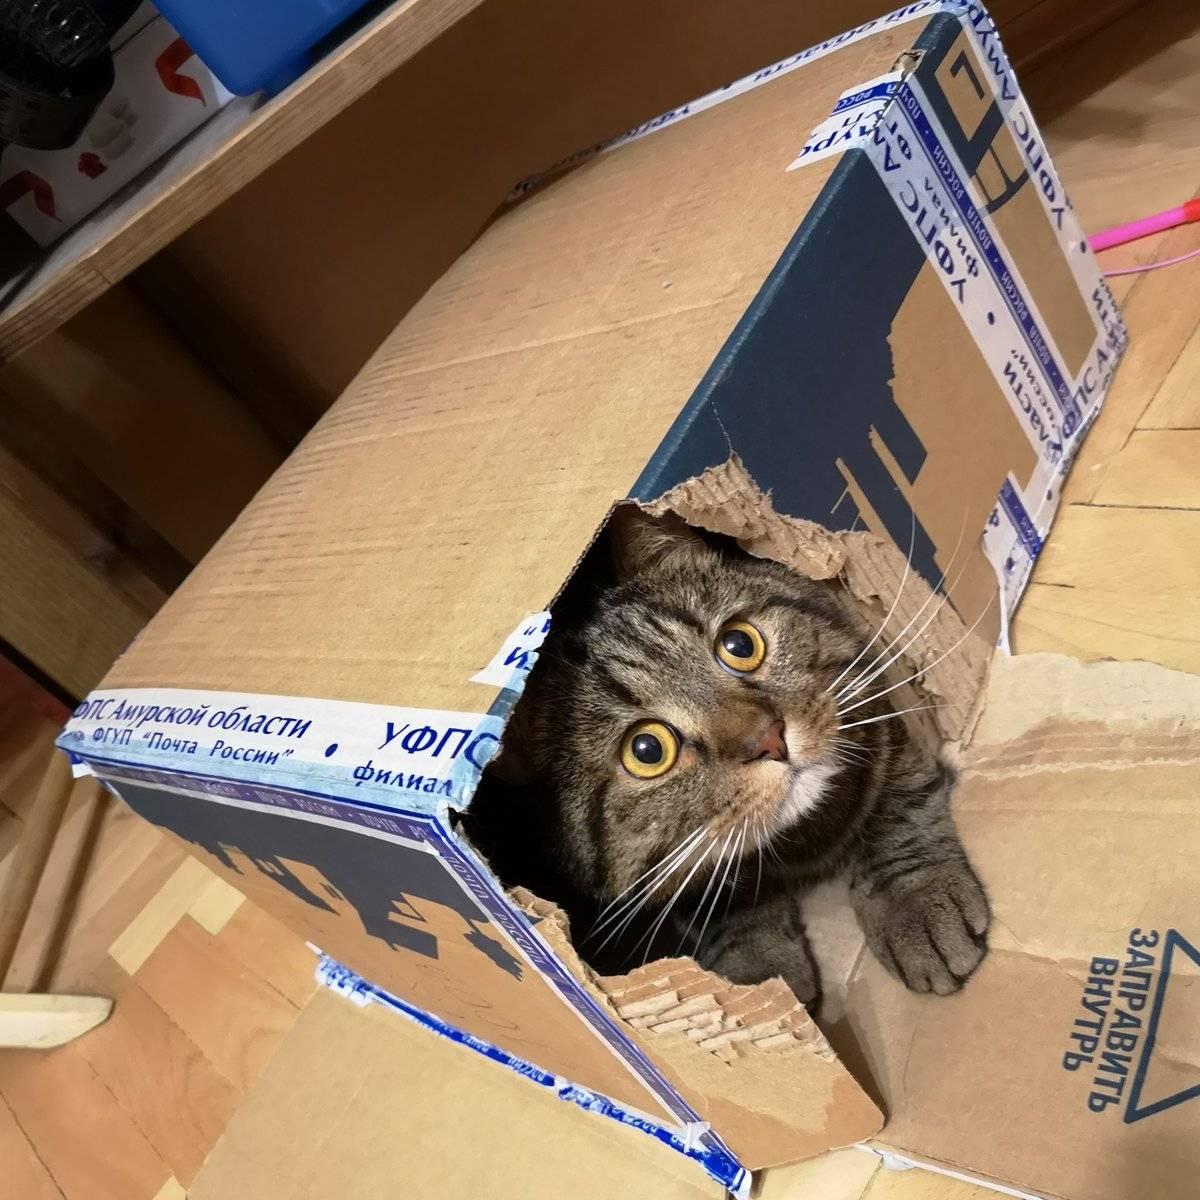 Почему кошки так любят коробки и пакеты